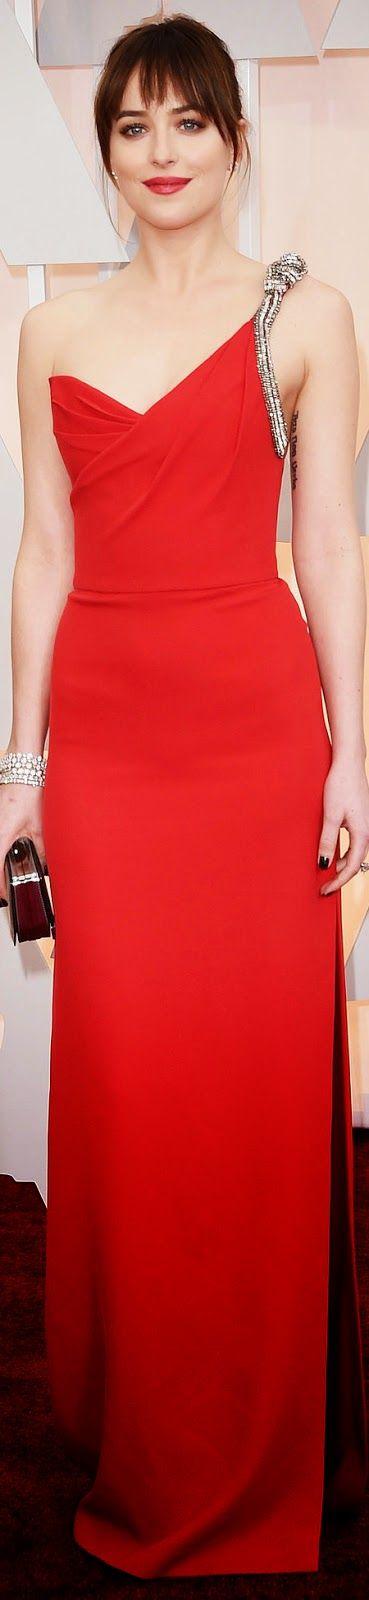 Dakota Johnson steps out in a scarlet Saint Laurent gown with crystal-embellished strap. 2015 Oscar Red Carpet